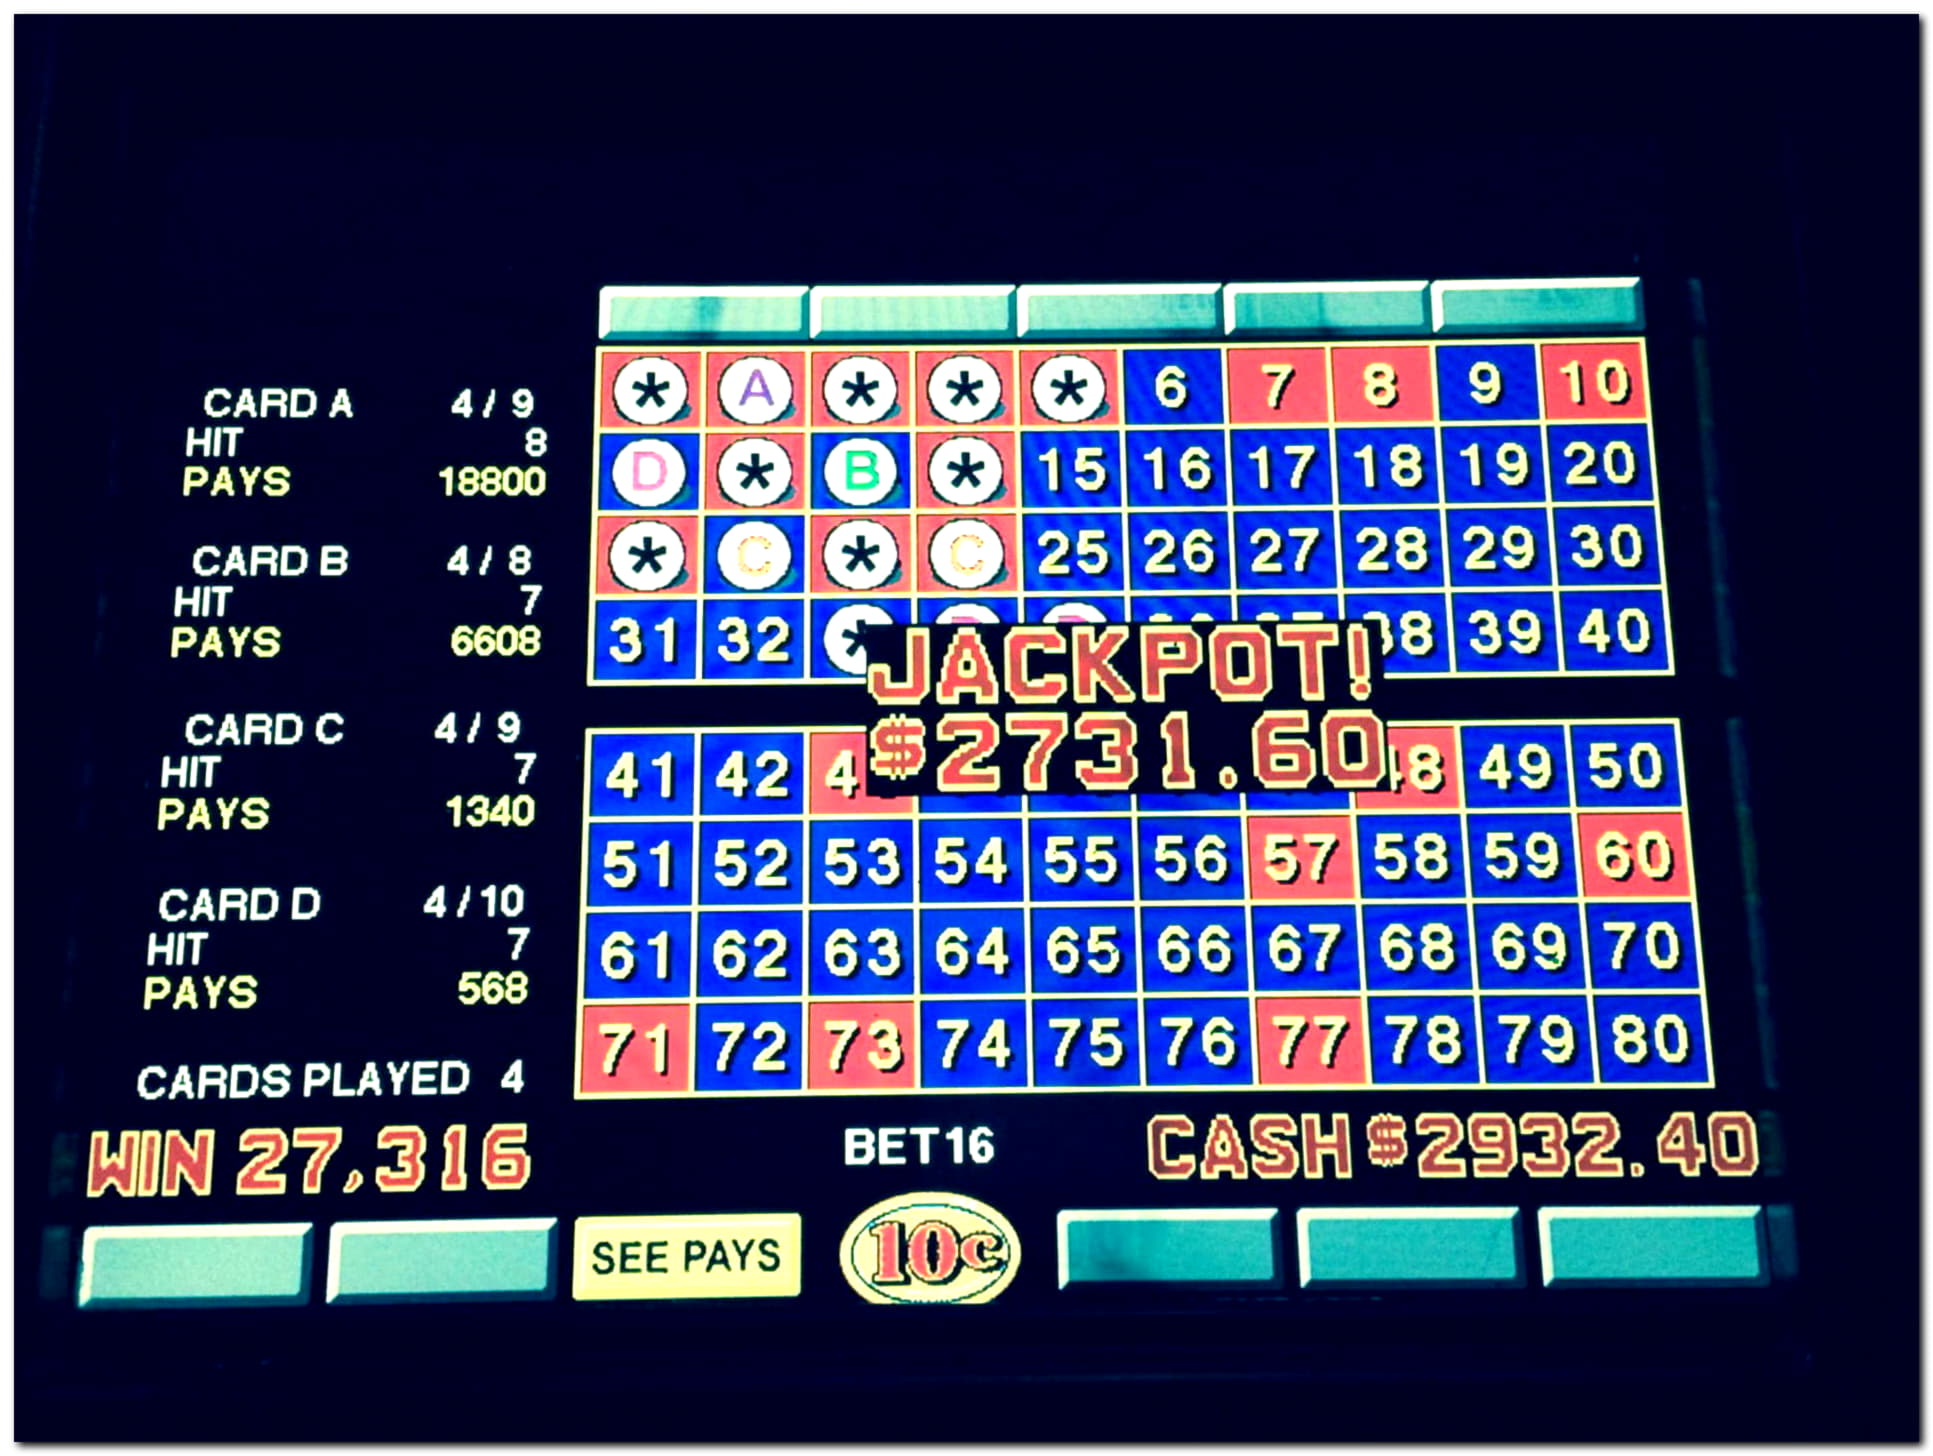 Eur 3515 χωρίς κωδικό μπόνους κατάθεσης στο καζίνο Yako